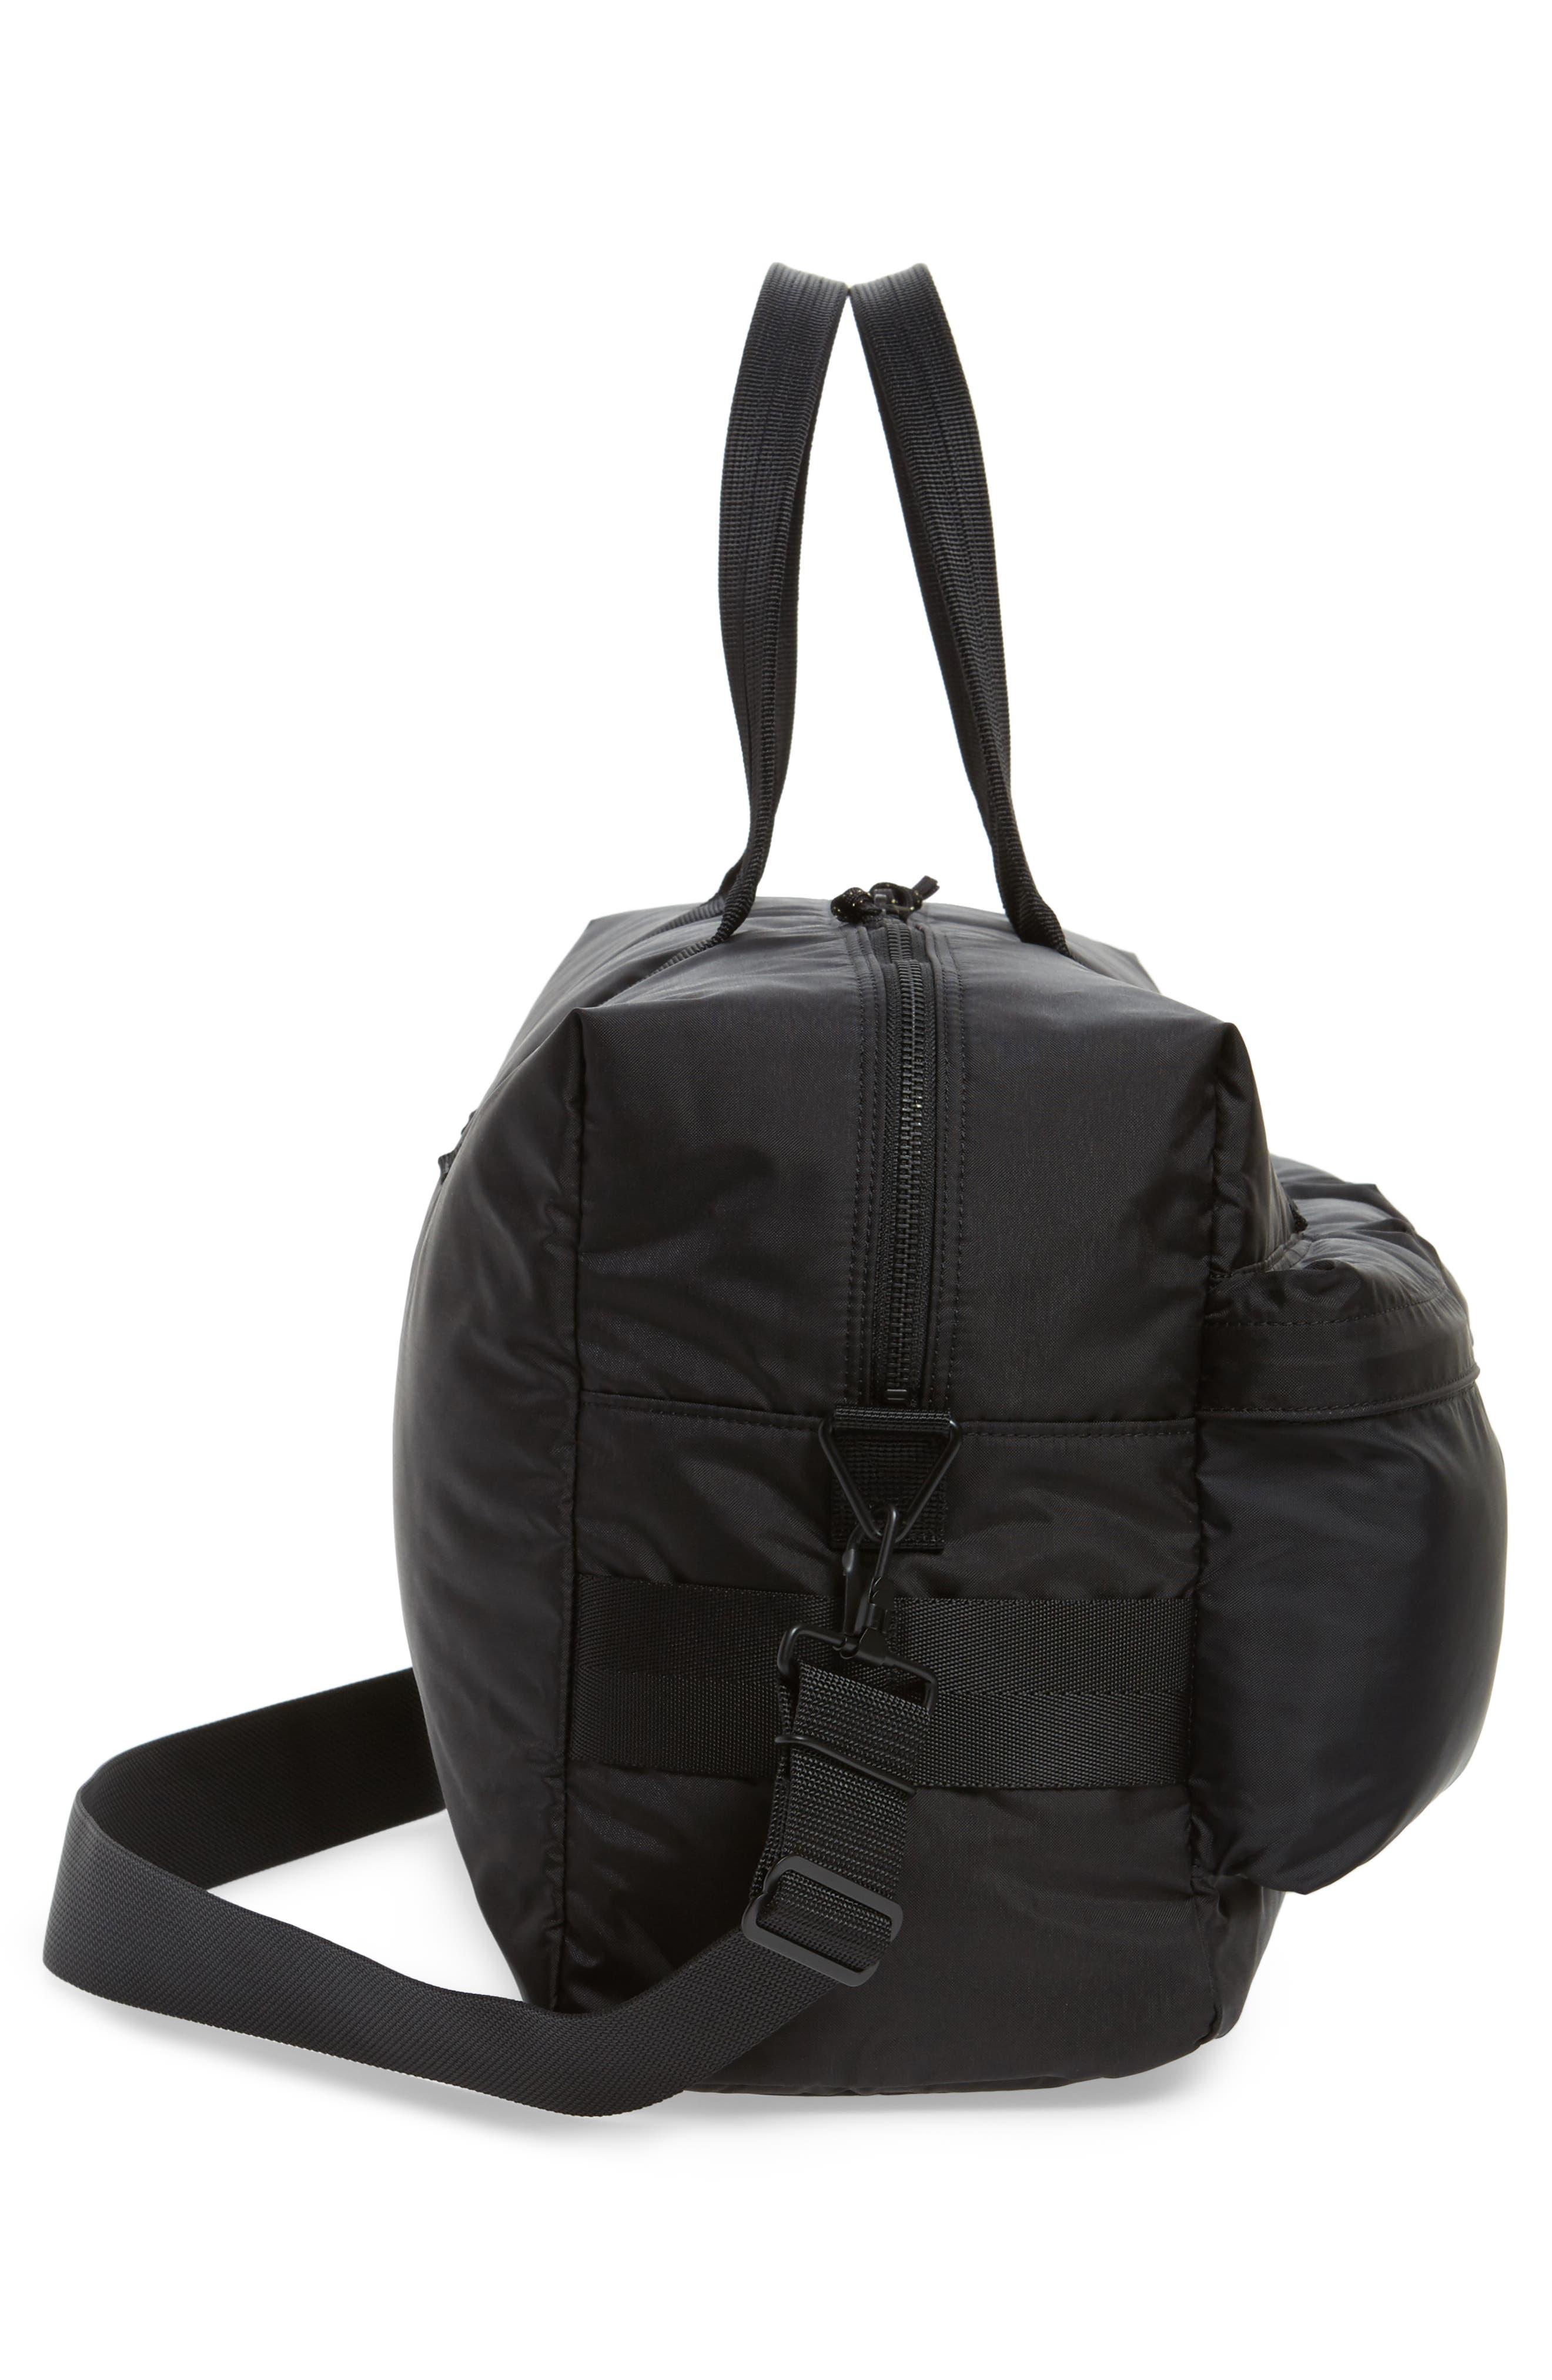 Porter-Yoshida & Co. Force Duffel Bag,                             Alternate thumbnail 5, color,                             Black